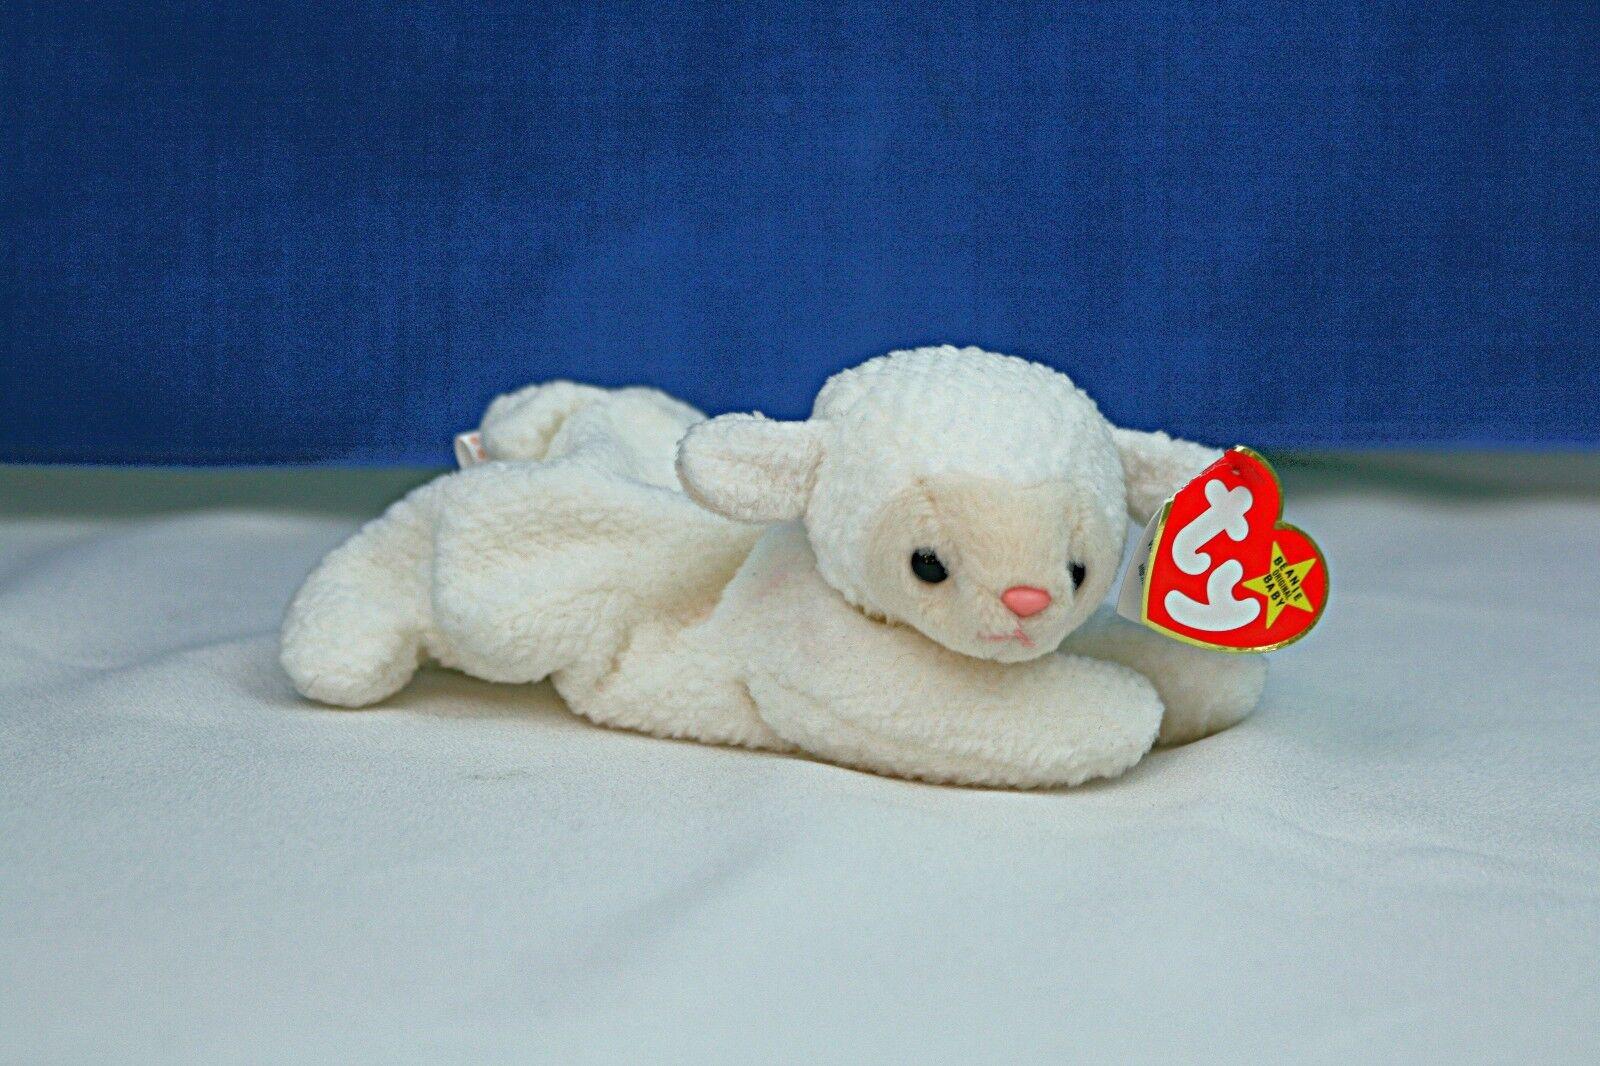 RARE Fleece the Lamb TY Beanie Baby style 4125, 9 errors, from Nurnberg